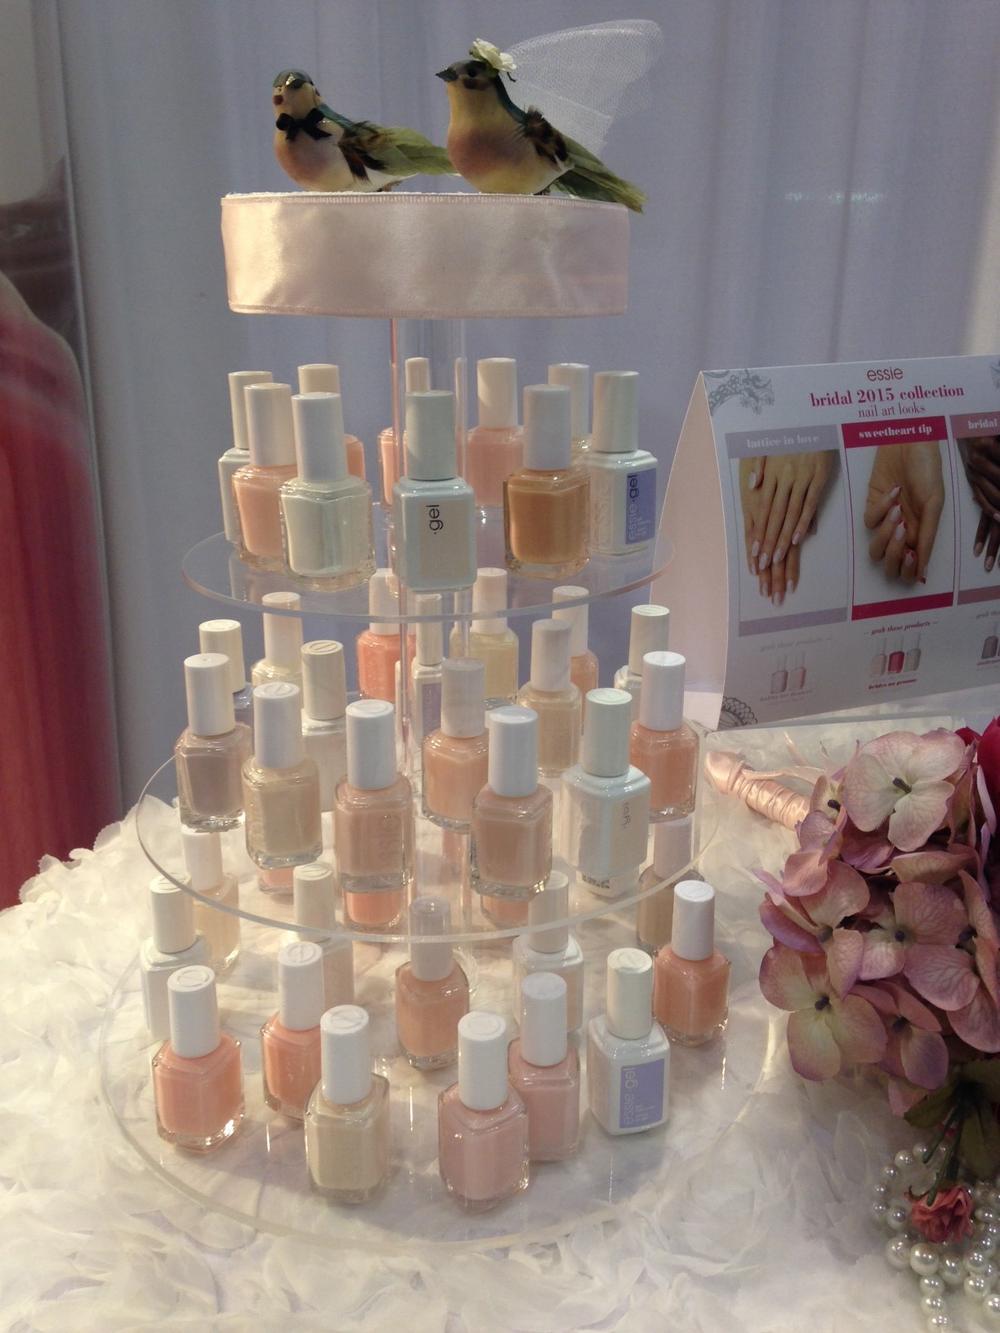 <p>Essie's Bridal 2015 collection</p>